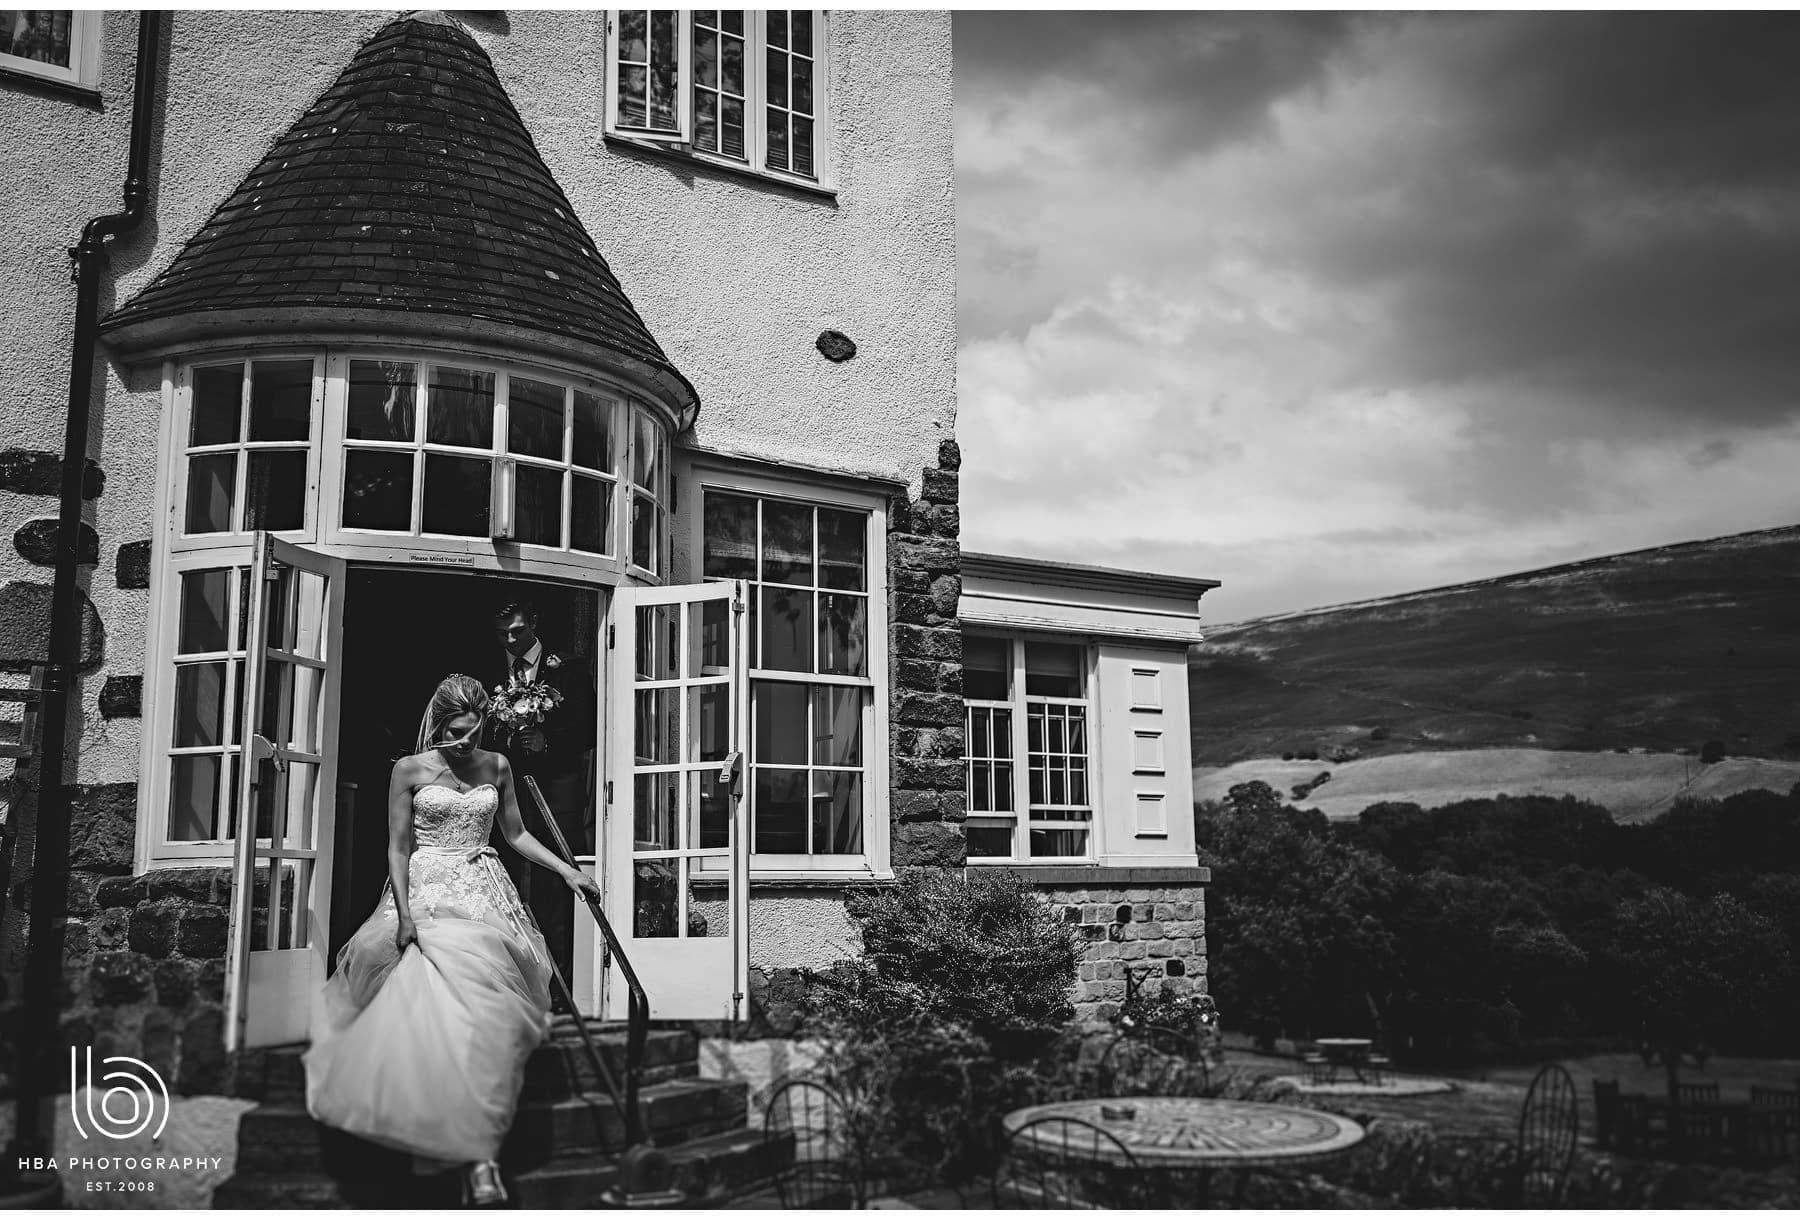 Losehill_House_Wedding_Photos_Derbyshire_Peak_District_